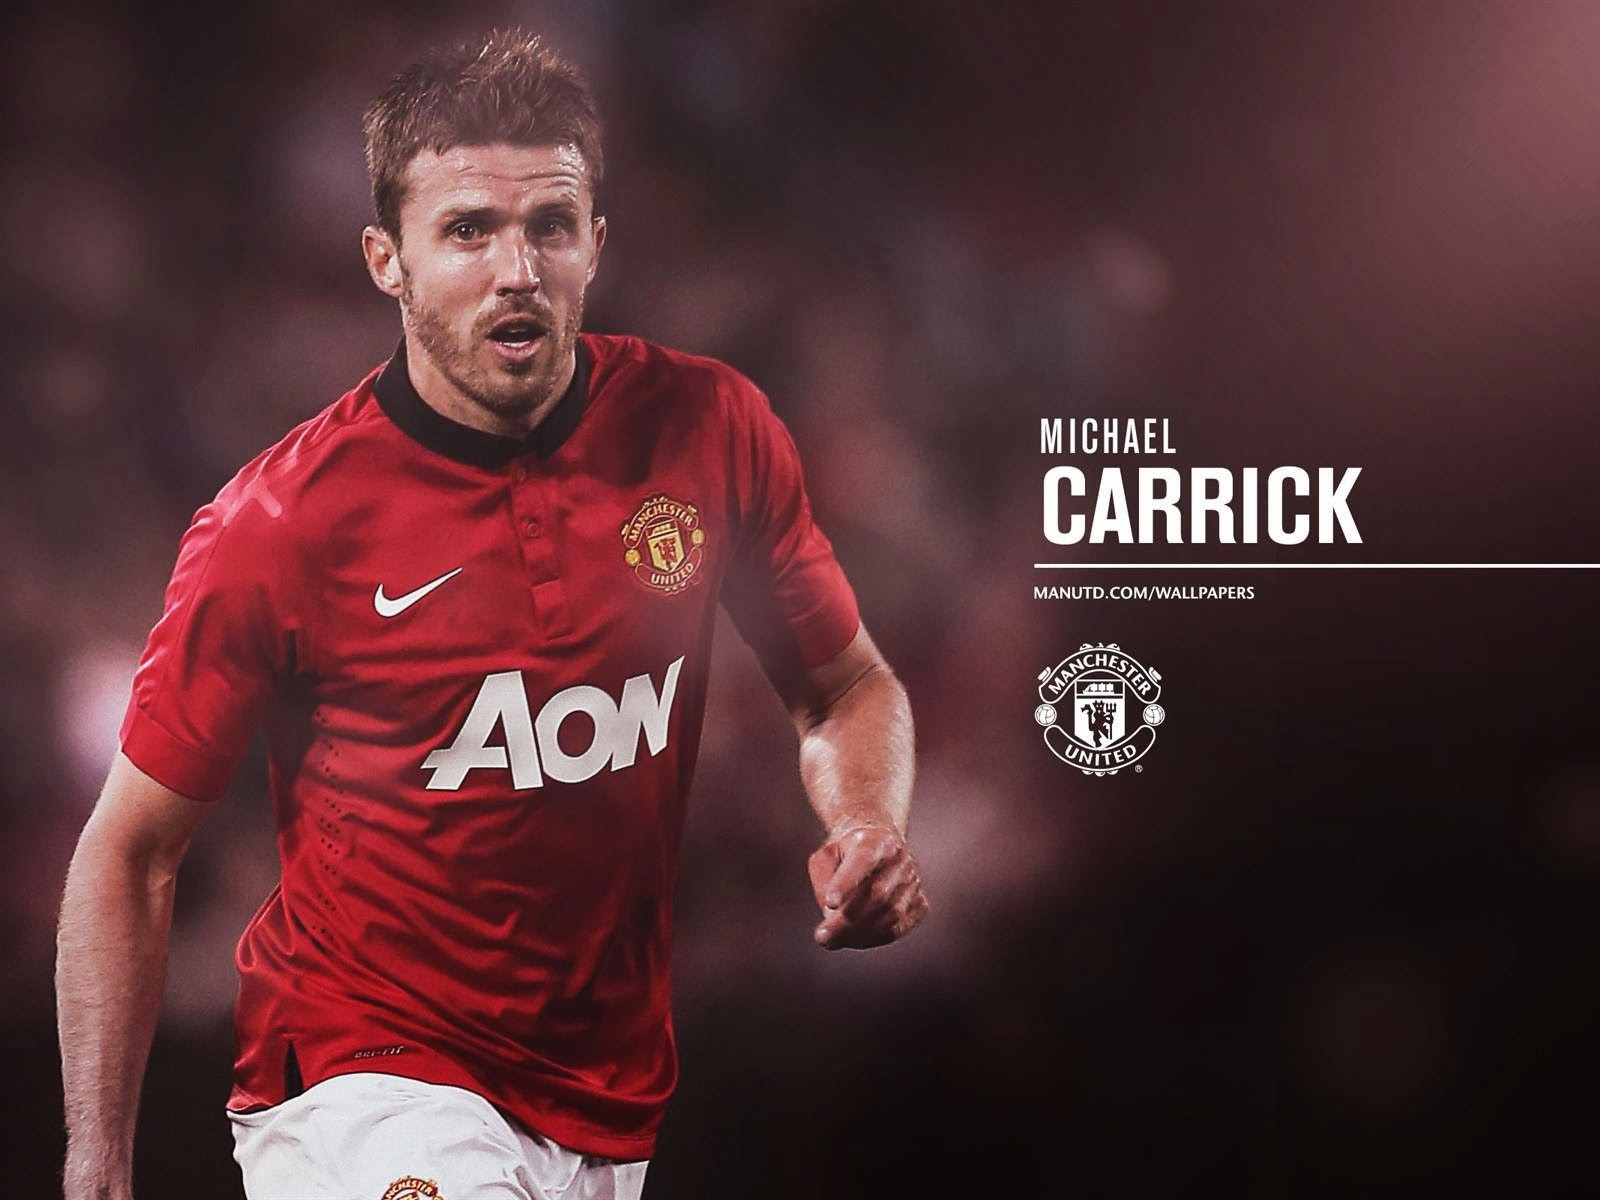 Dipercaya Mourinho, Pereira Mengatakan Hutang Budi pada Carrick